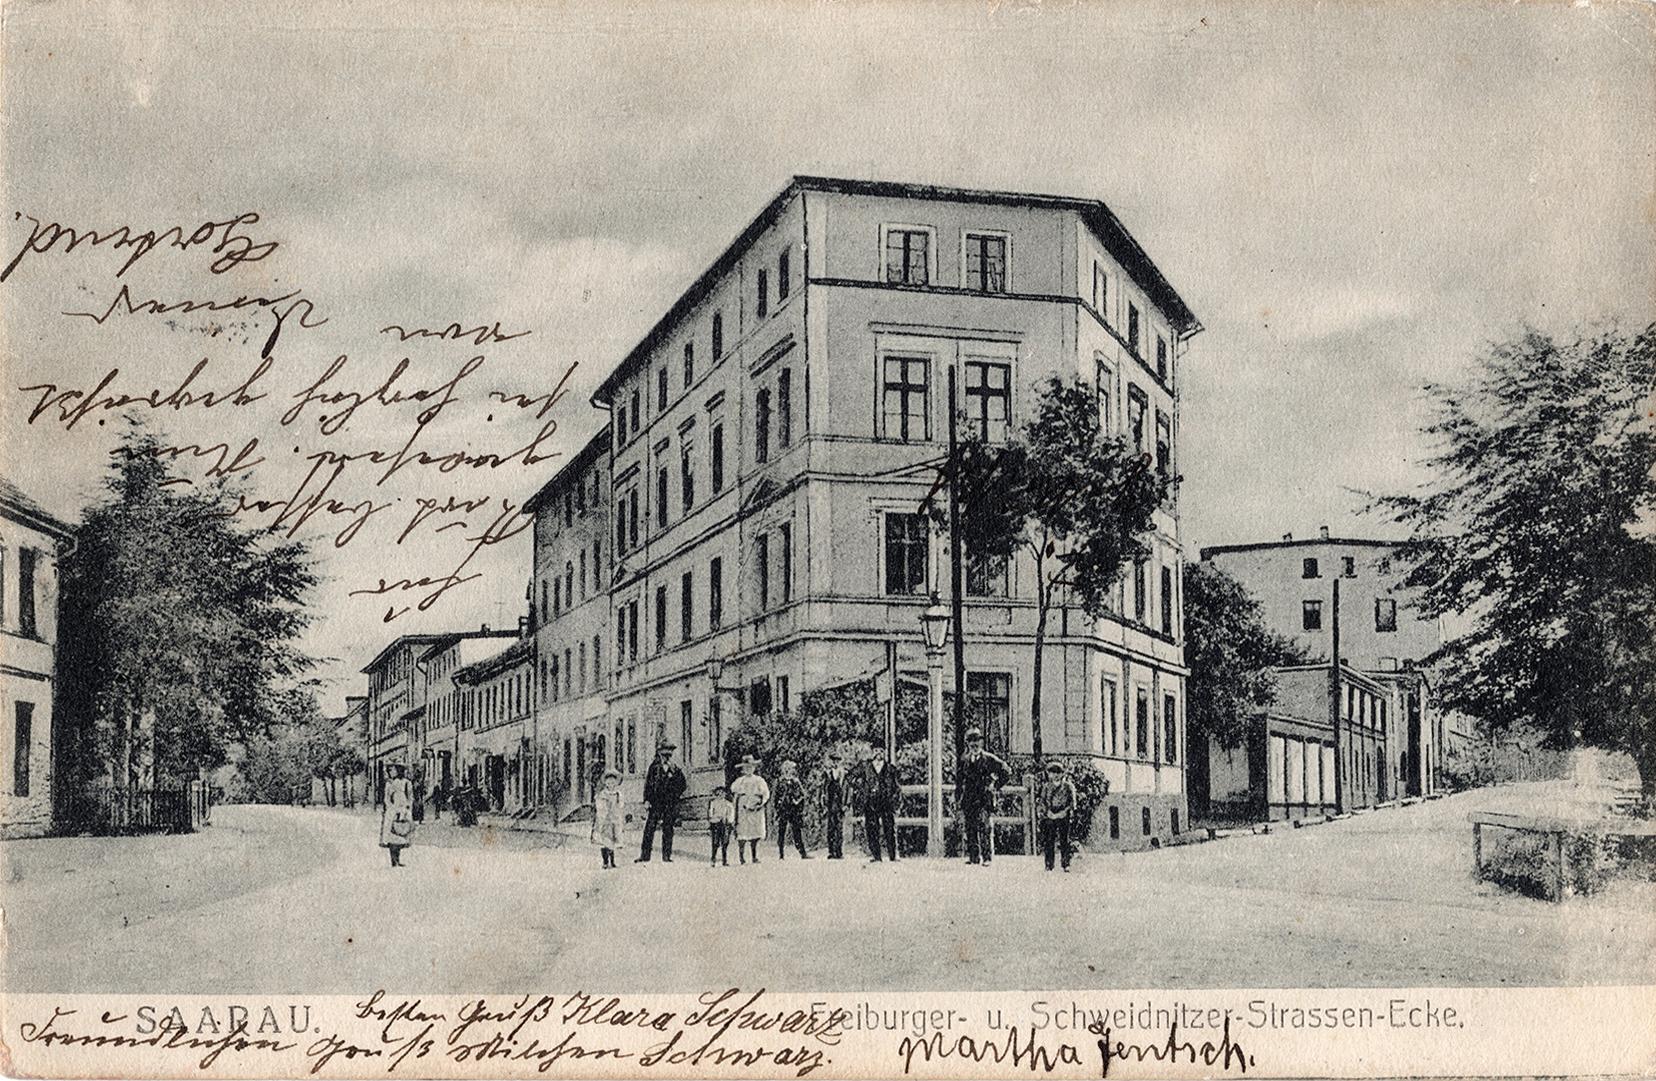 Saarau Freiburger- u. Schweidnitzer-Strassen-Ecke 1908 (1)